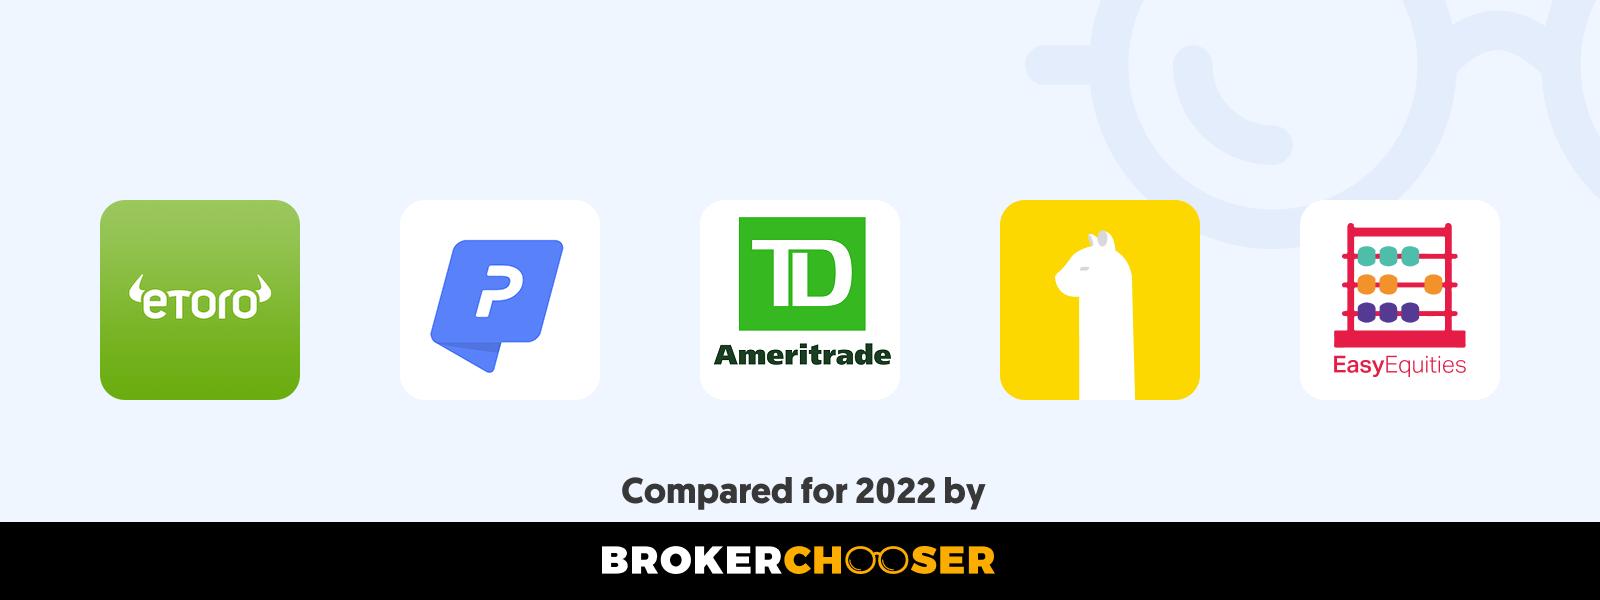 Best brokers for beginners in Brazil in 2020